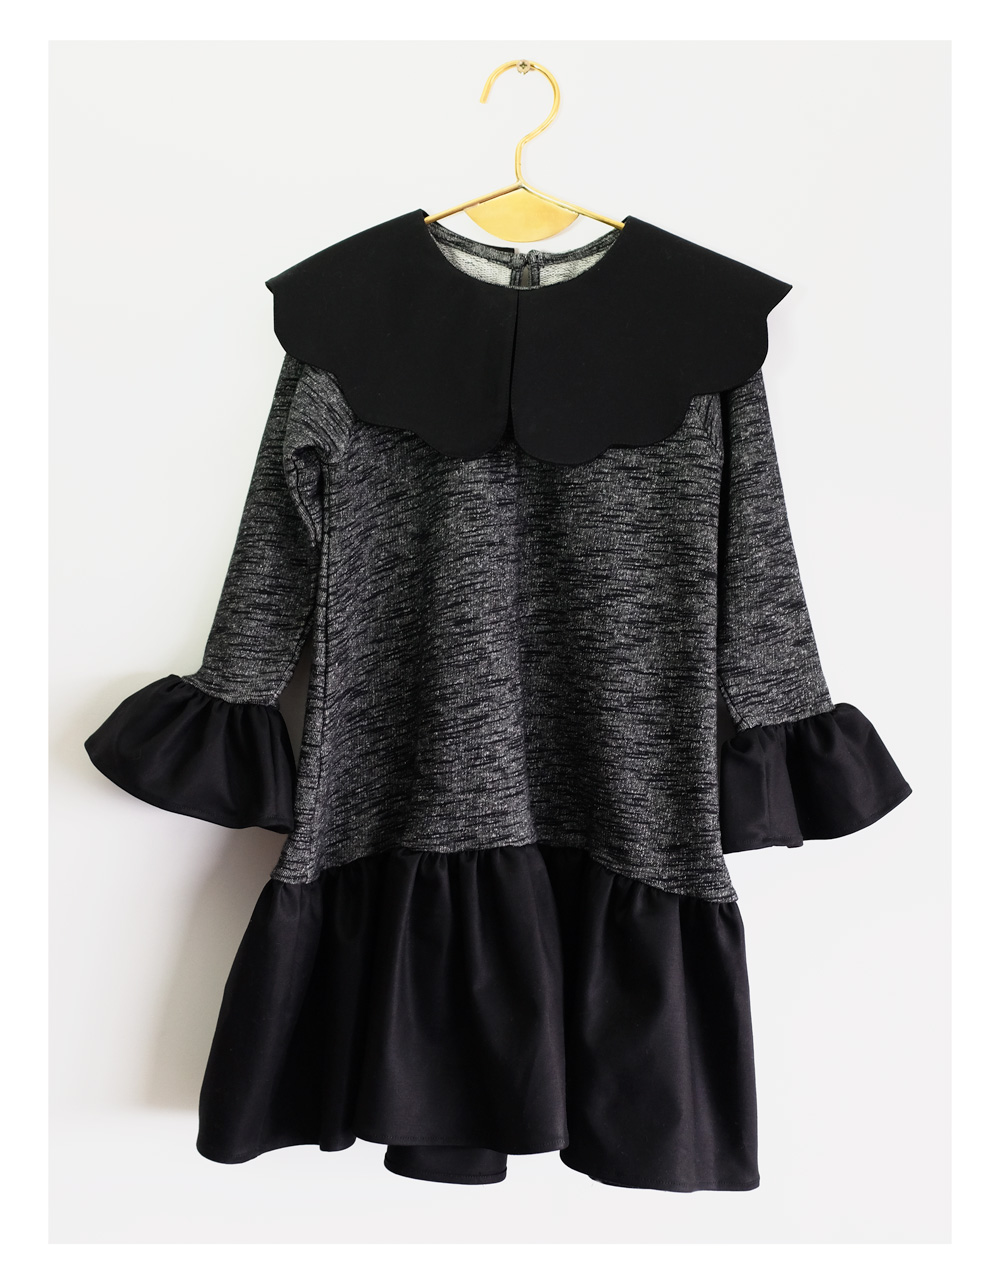 ●WOLF & RITA ウルフ&リタ ODETE - Dress BLACK /GREY -/-/-/-